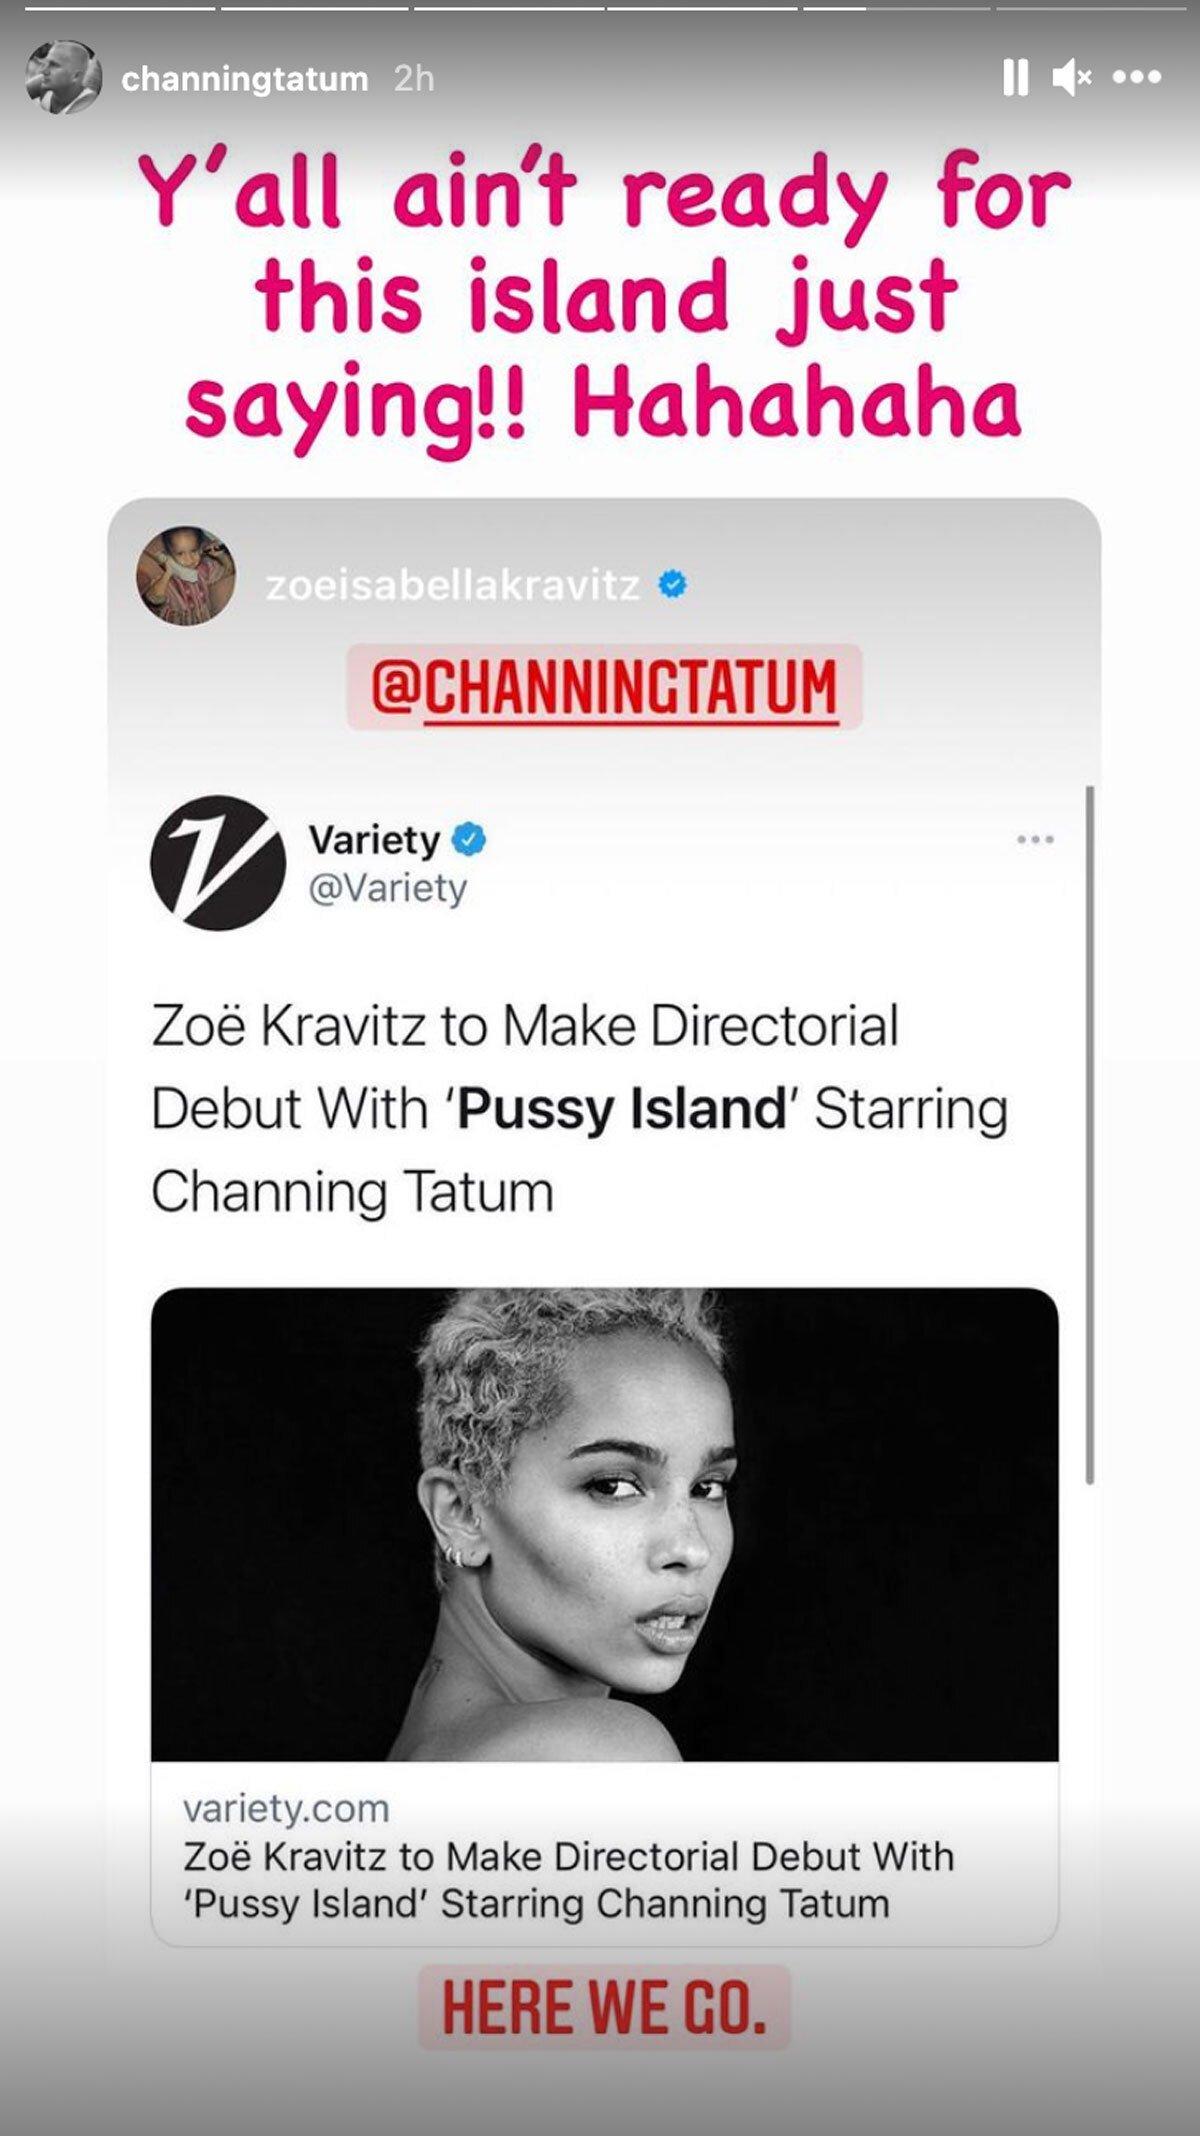 Channing Tatum Instagram Stories Pussy Island.